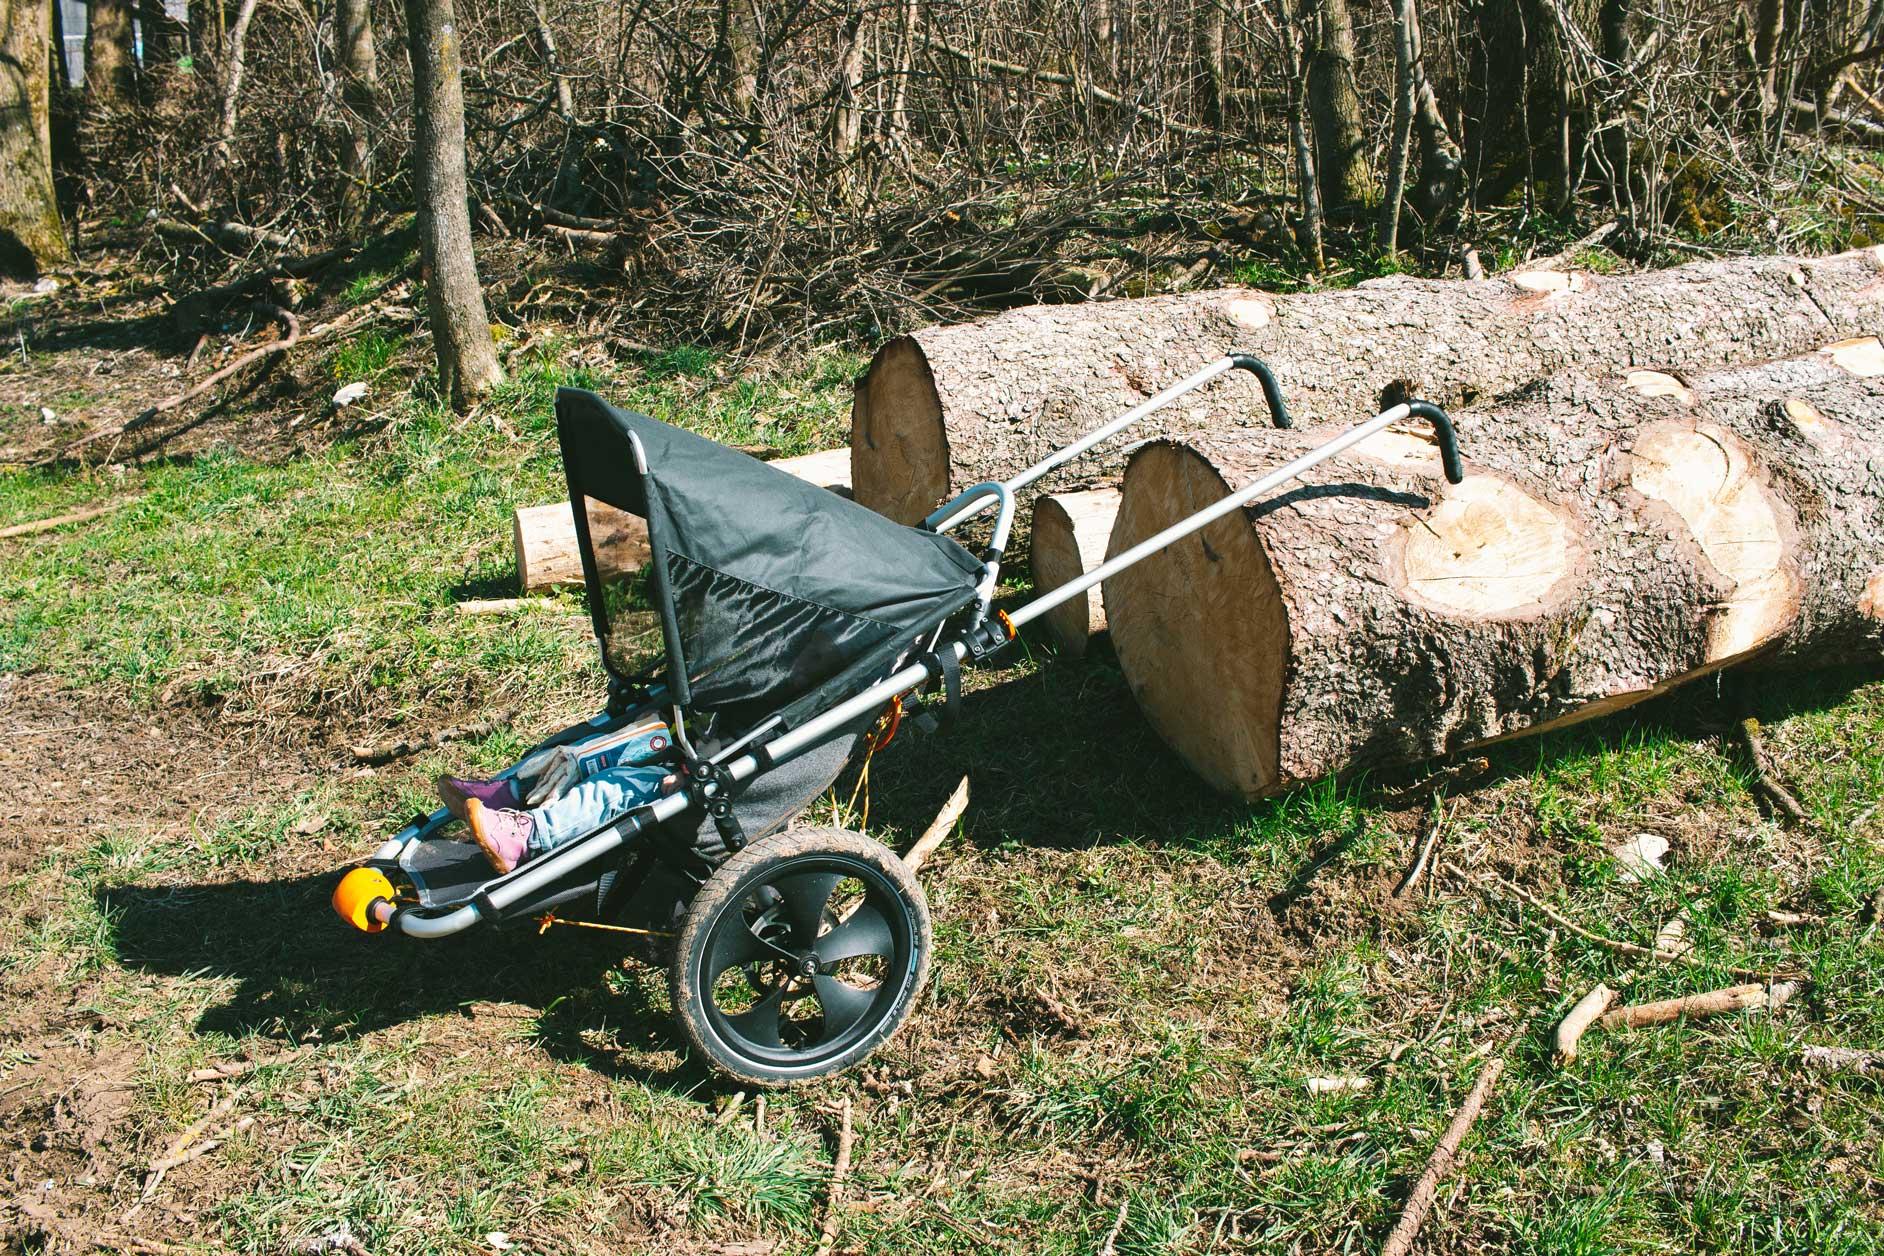 Baumstaemme-outdoor-kinderwagen-wald